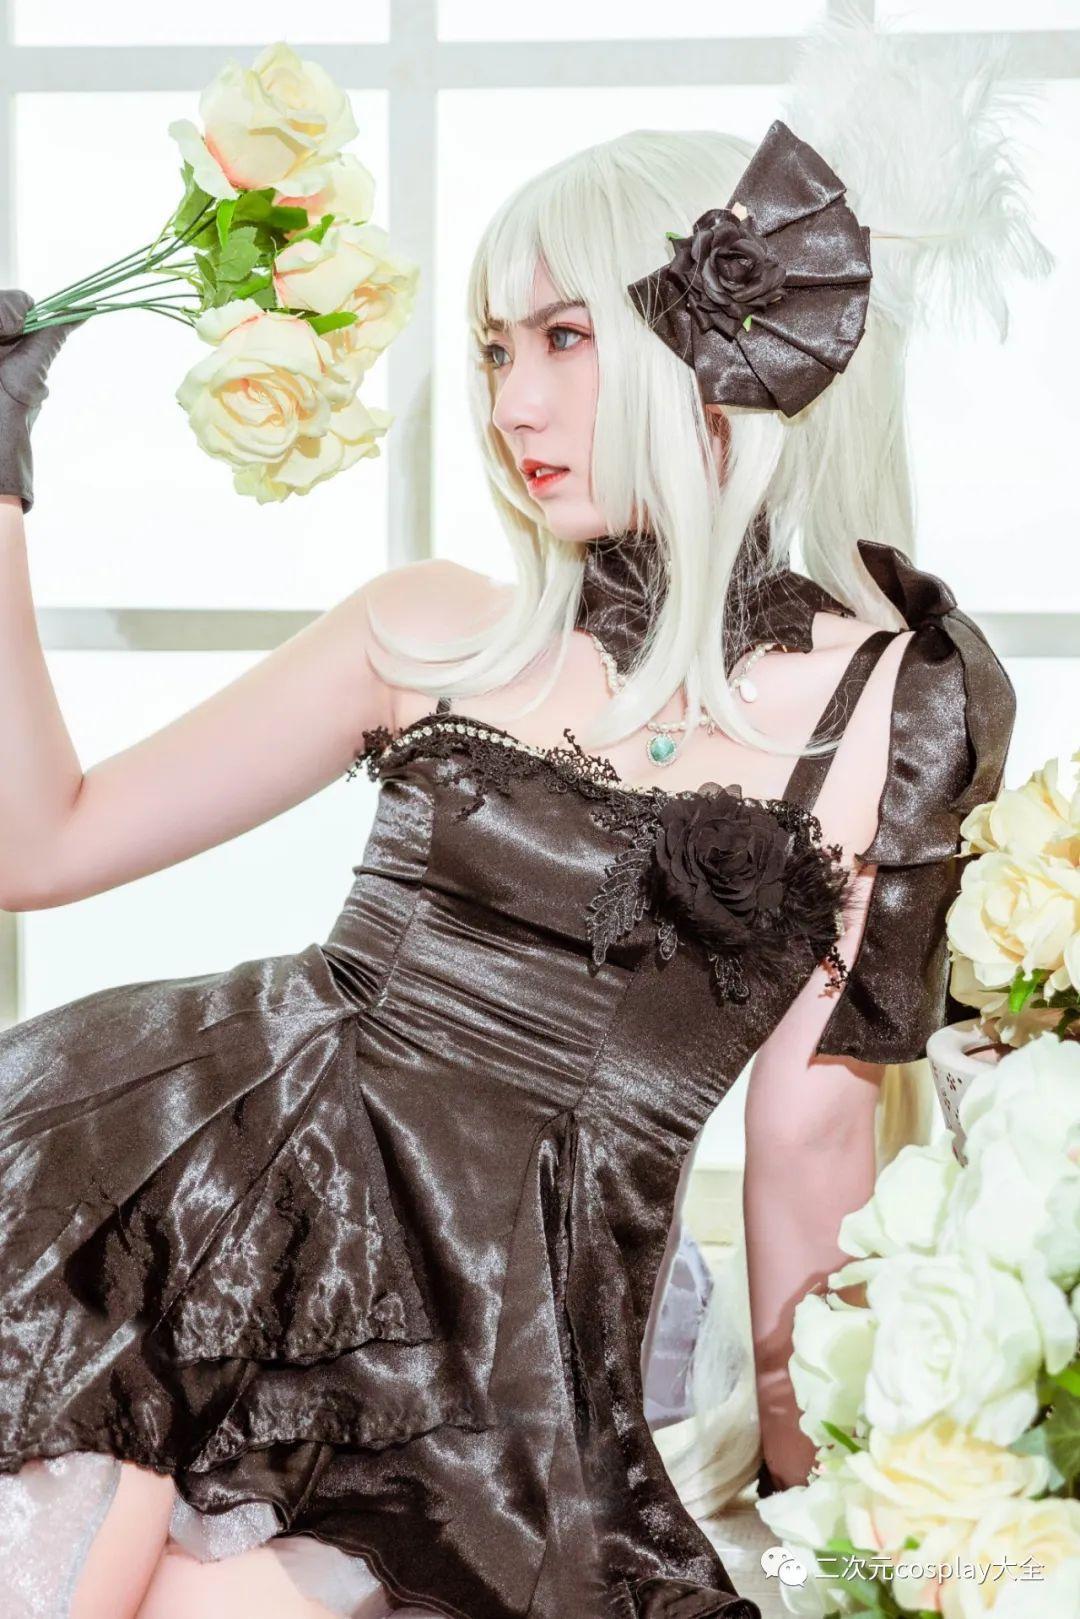 cosplay – FGO玛丽安托瓦内特,优雅俊美,笑靥如花的美少女 - [leimu486.com] No.9